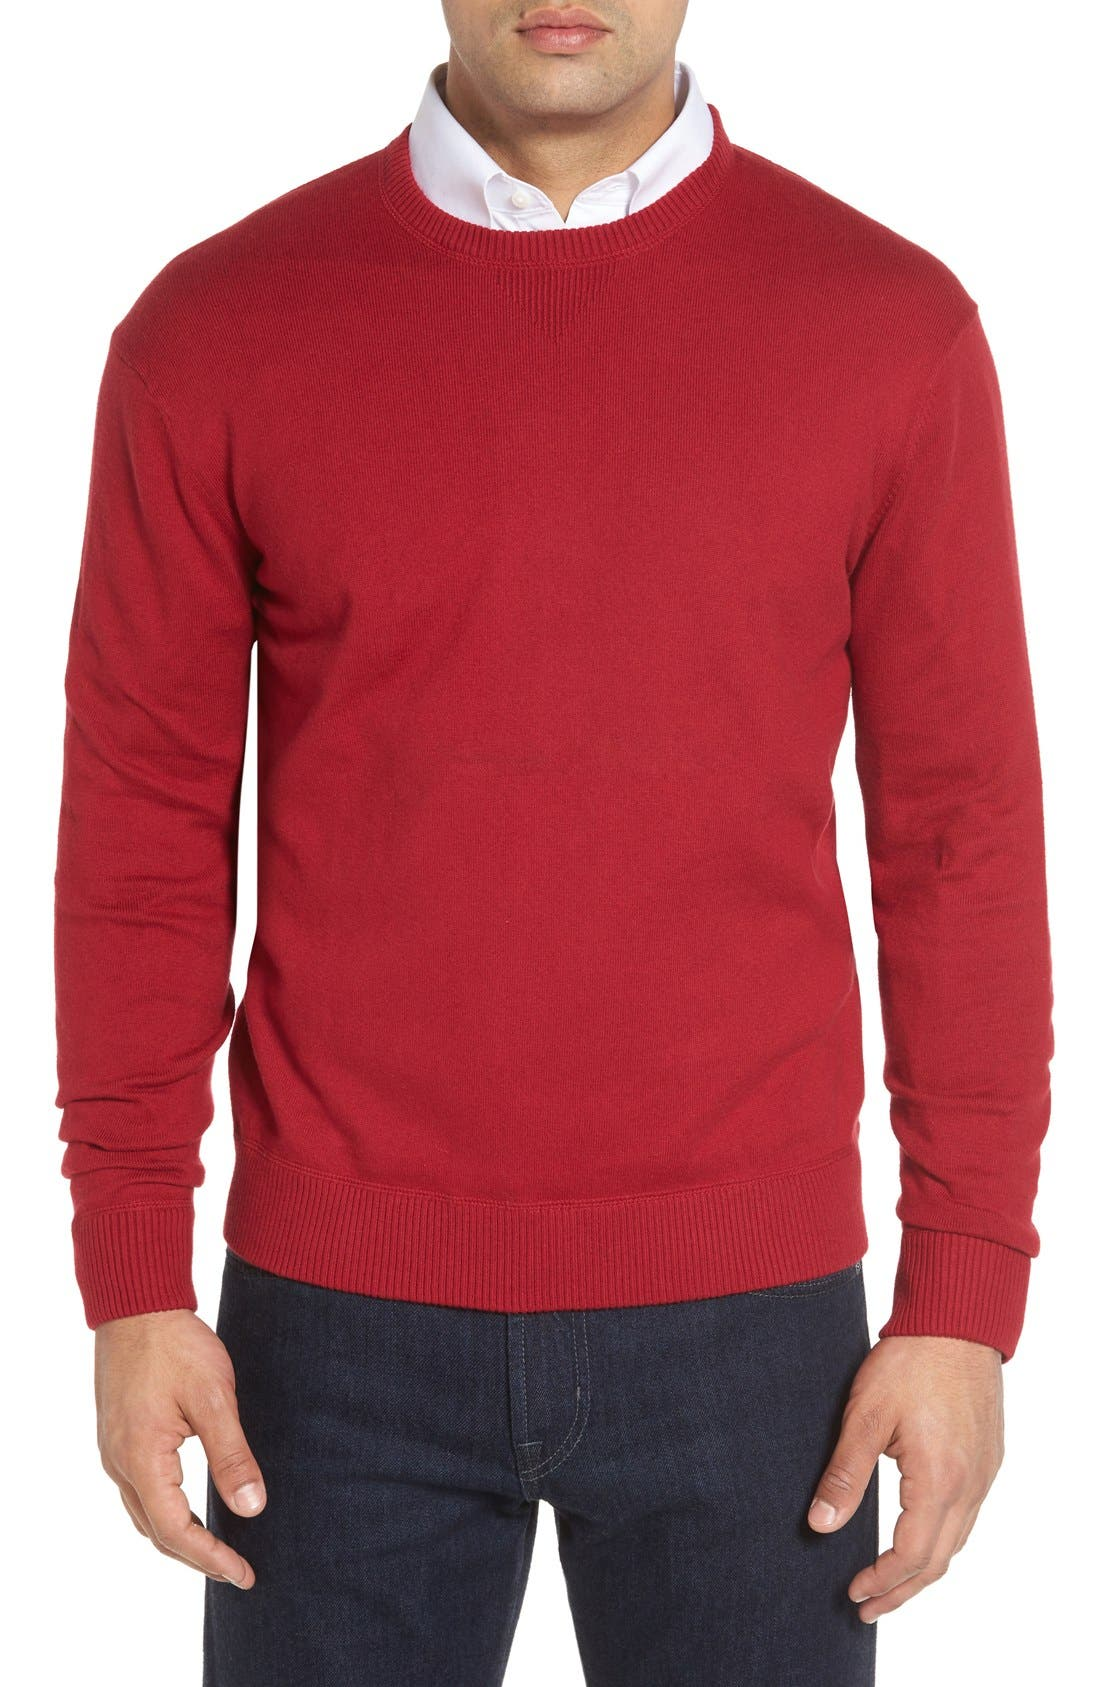 'Jersey Sport' Cotton Blend Crewneck Sweater,                             Main thumbnail 8, color,